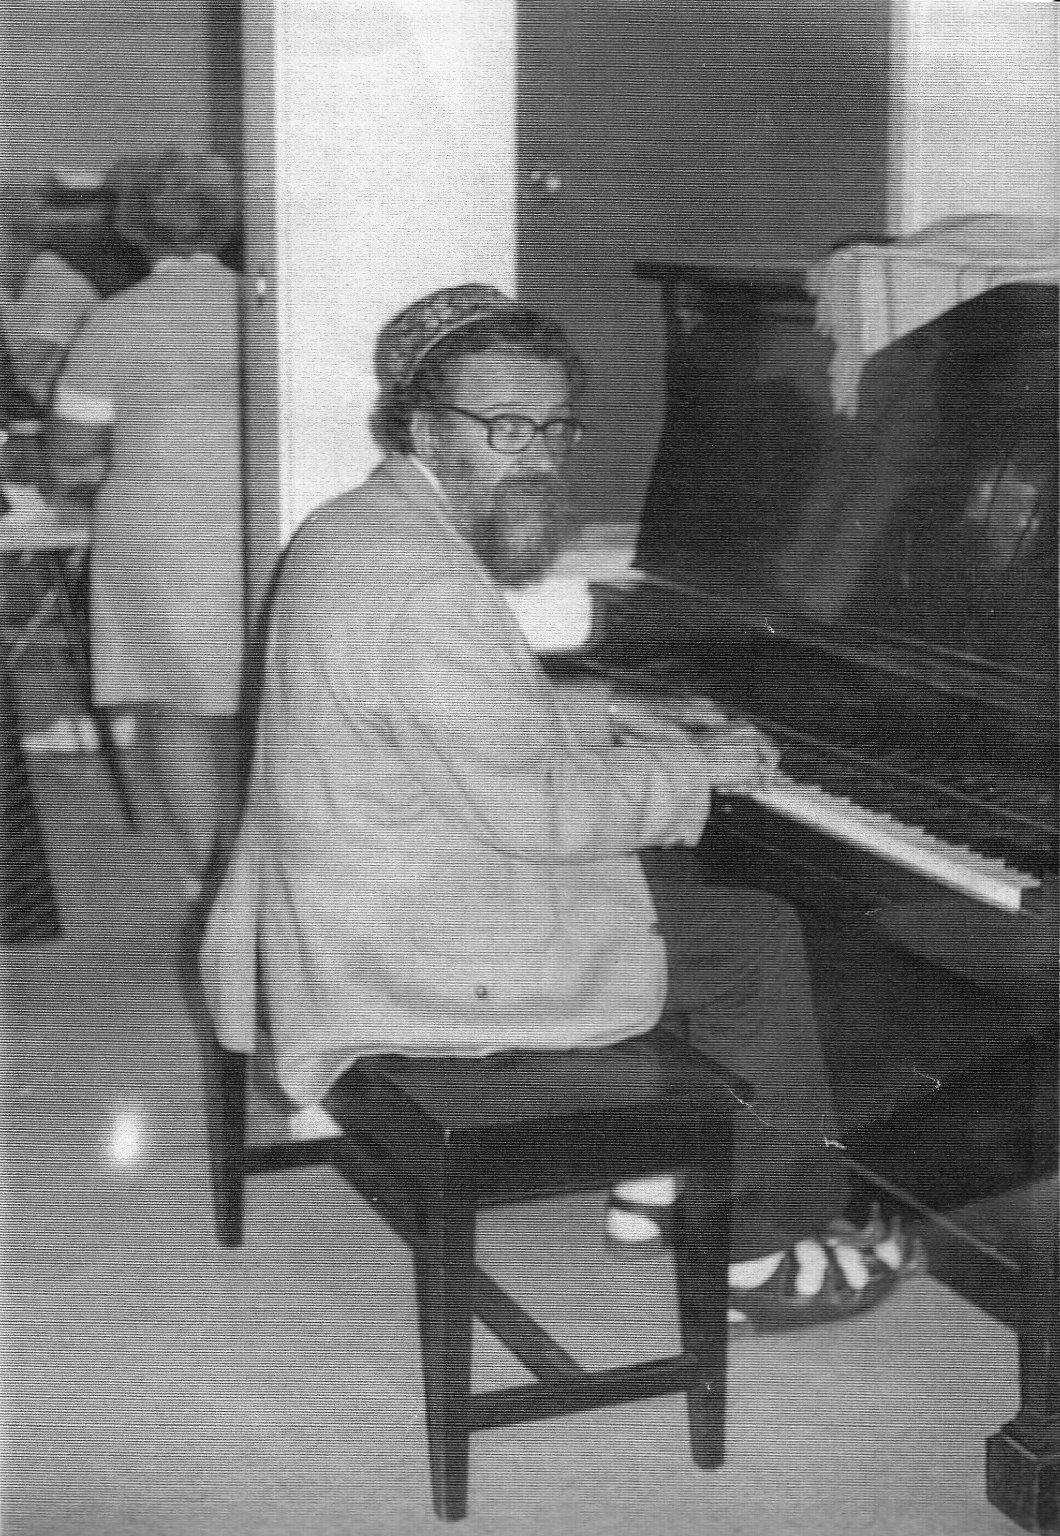 Rabbi Zalman Schachter playing the piano, ca. 1970s.